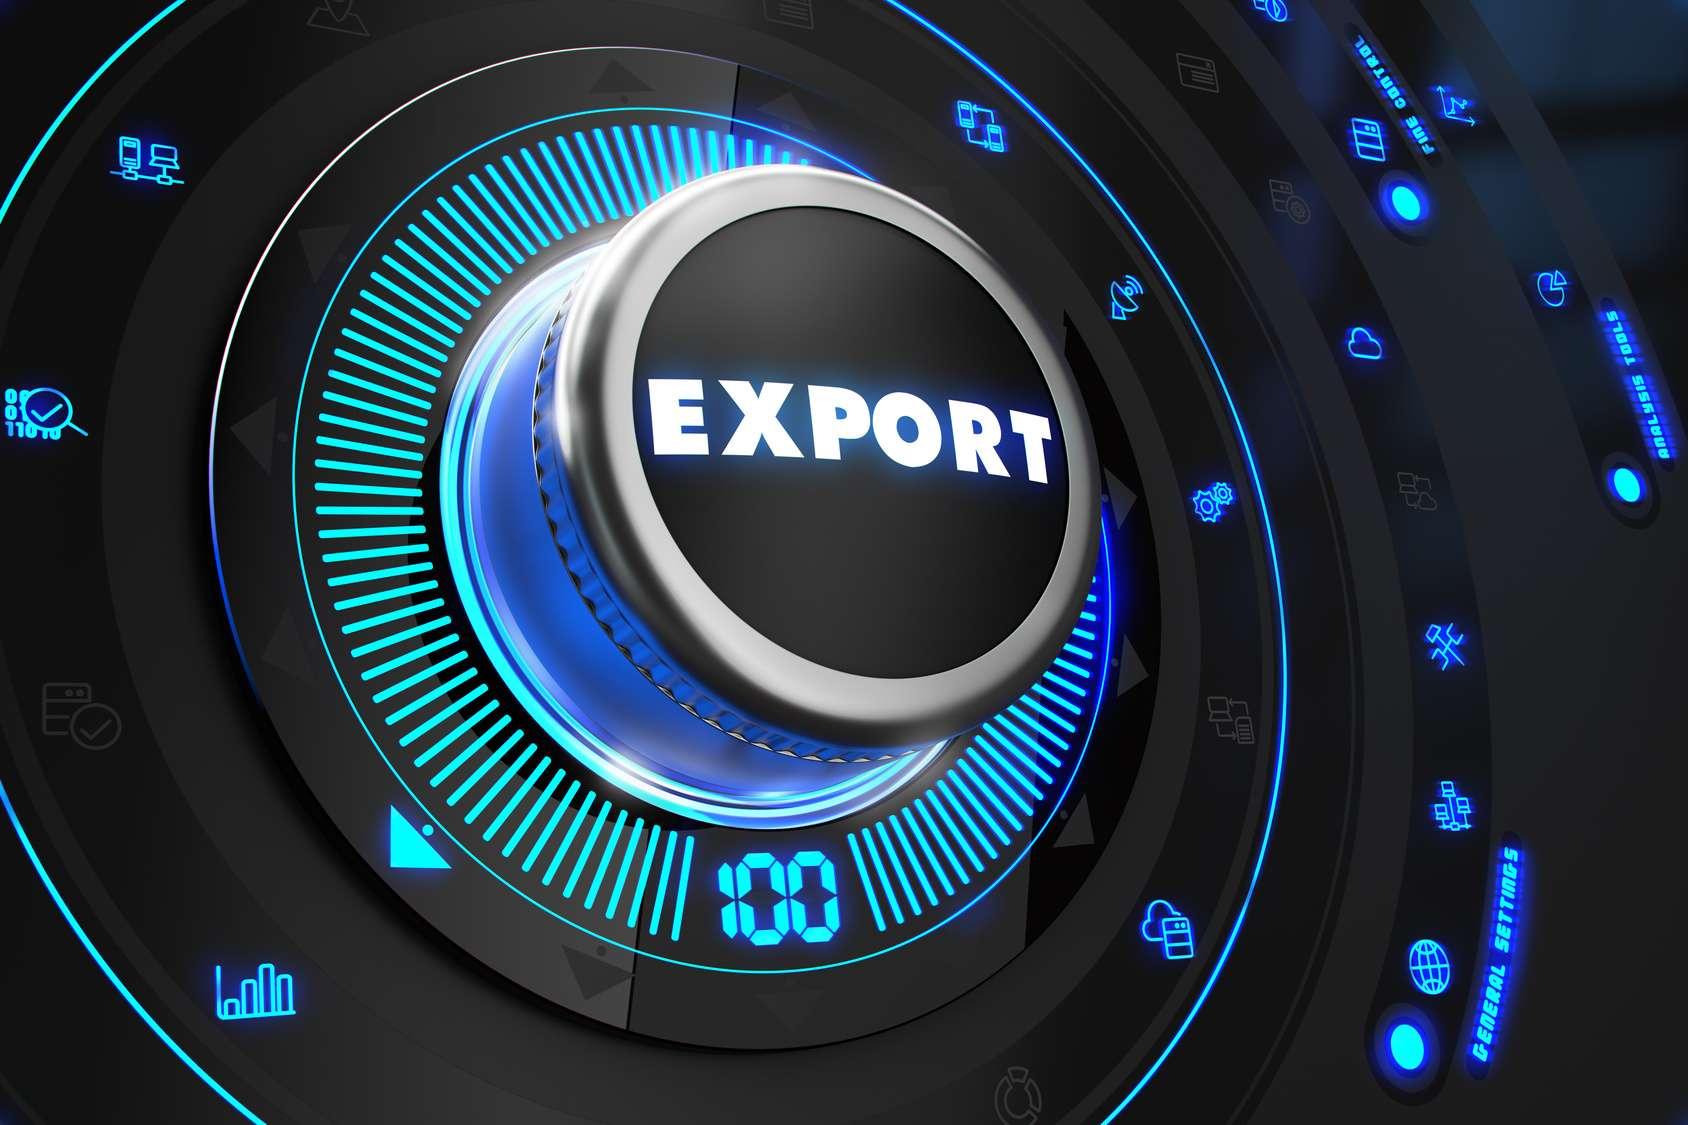 Export Regulator on Black Control